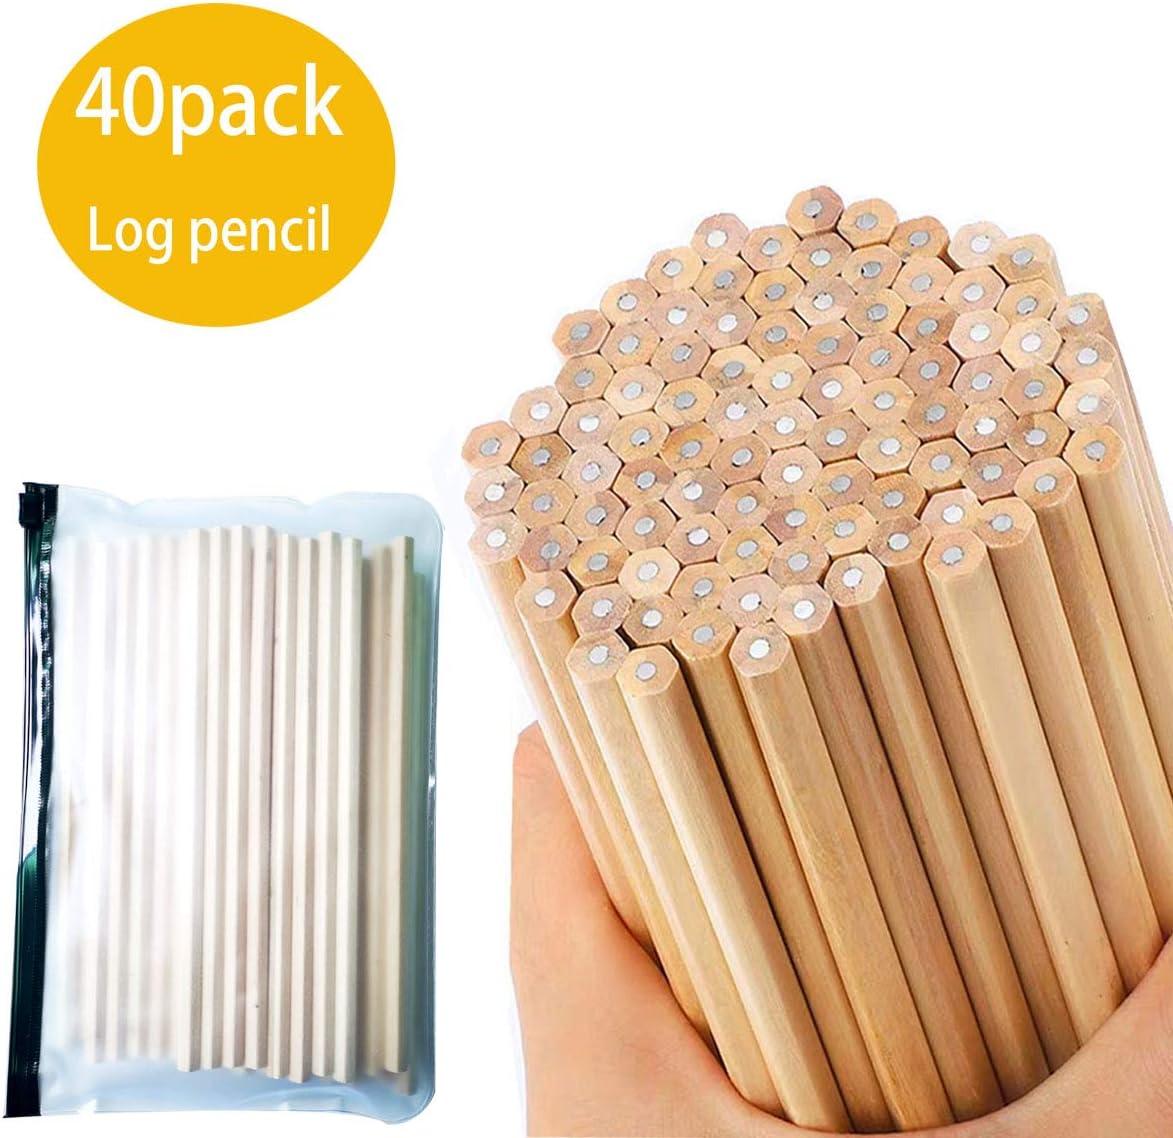 Hexagonal HB pencils 40 natural wood grain pencils childrens stationery